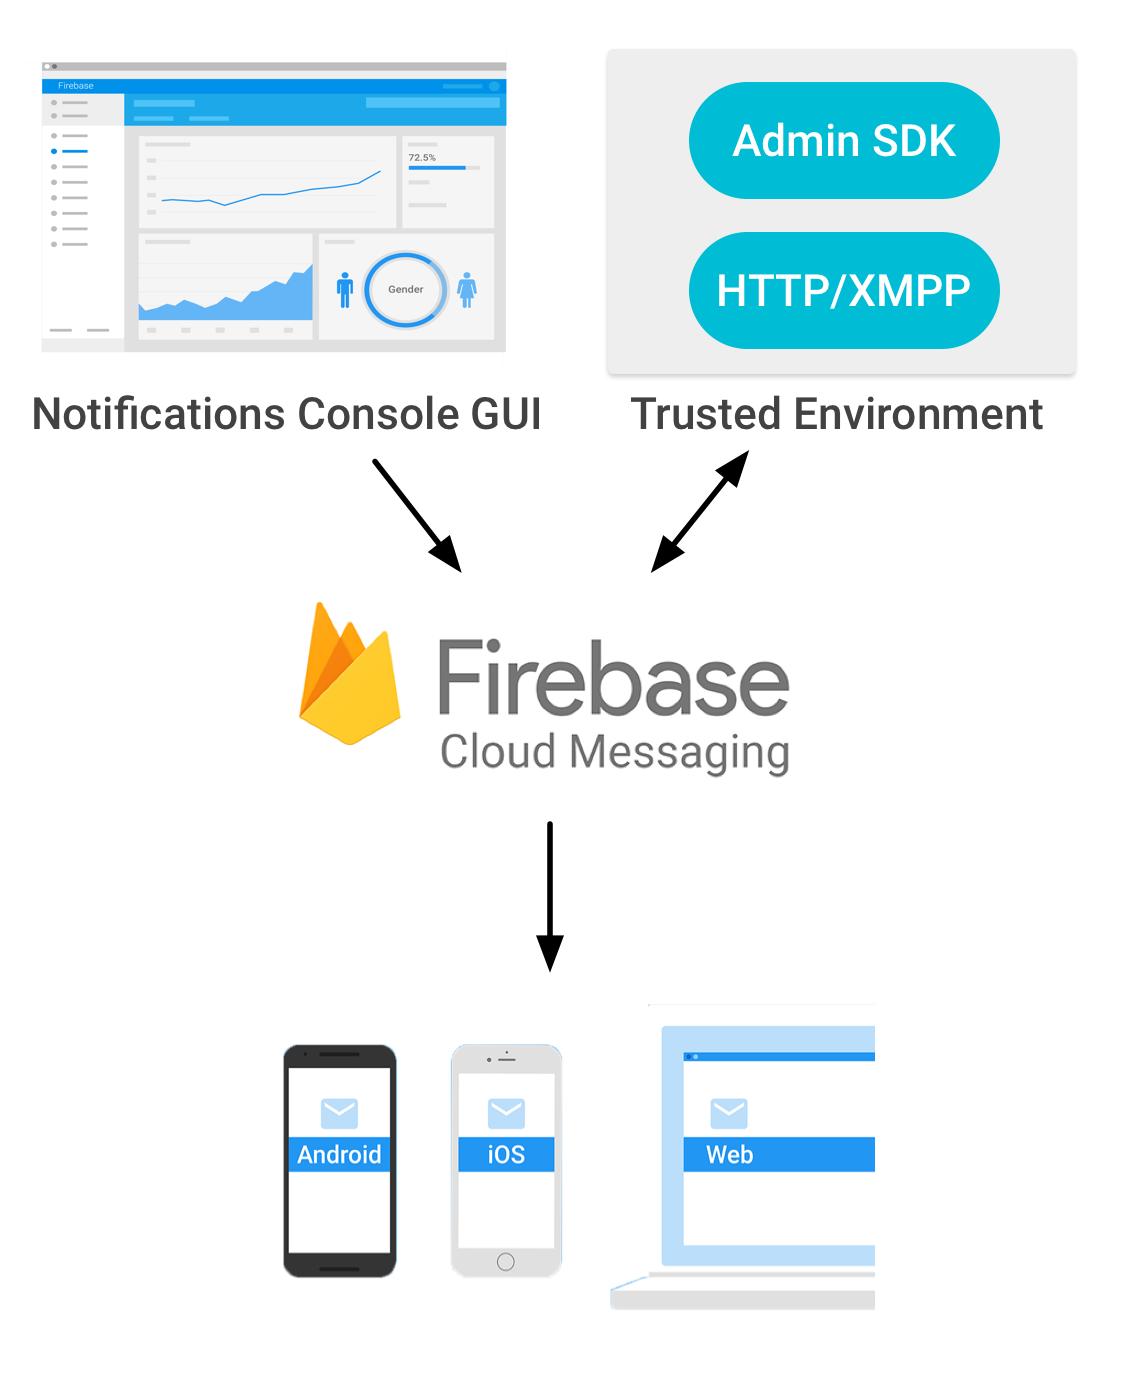 Diagrama da arquitetura do Firebase Cloud Messaging